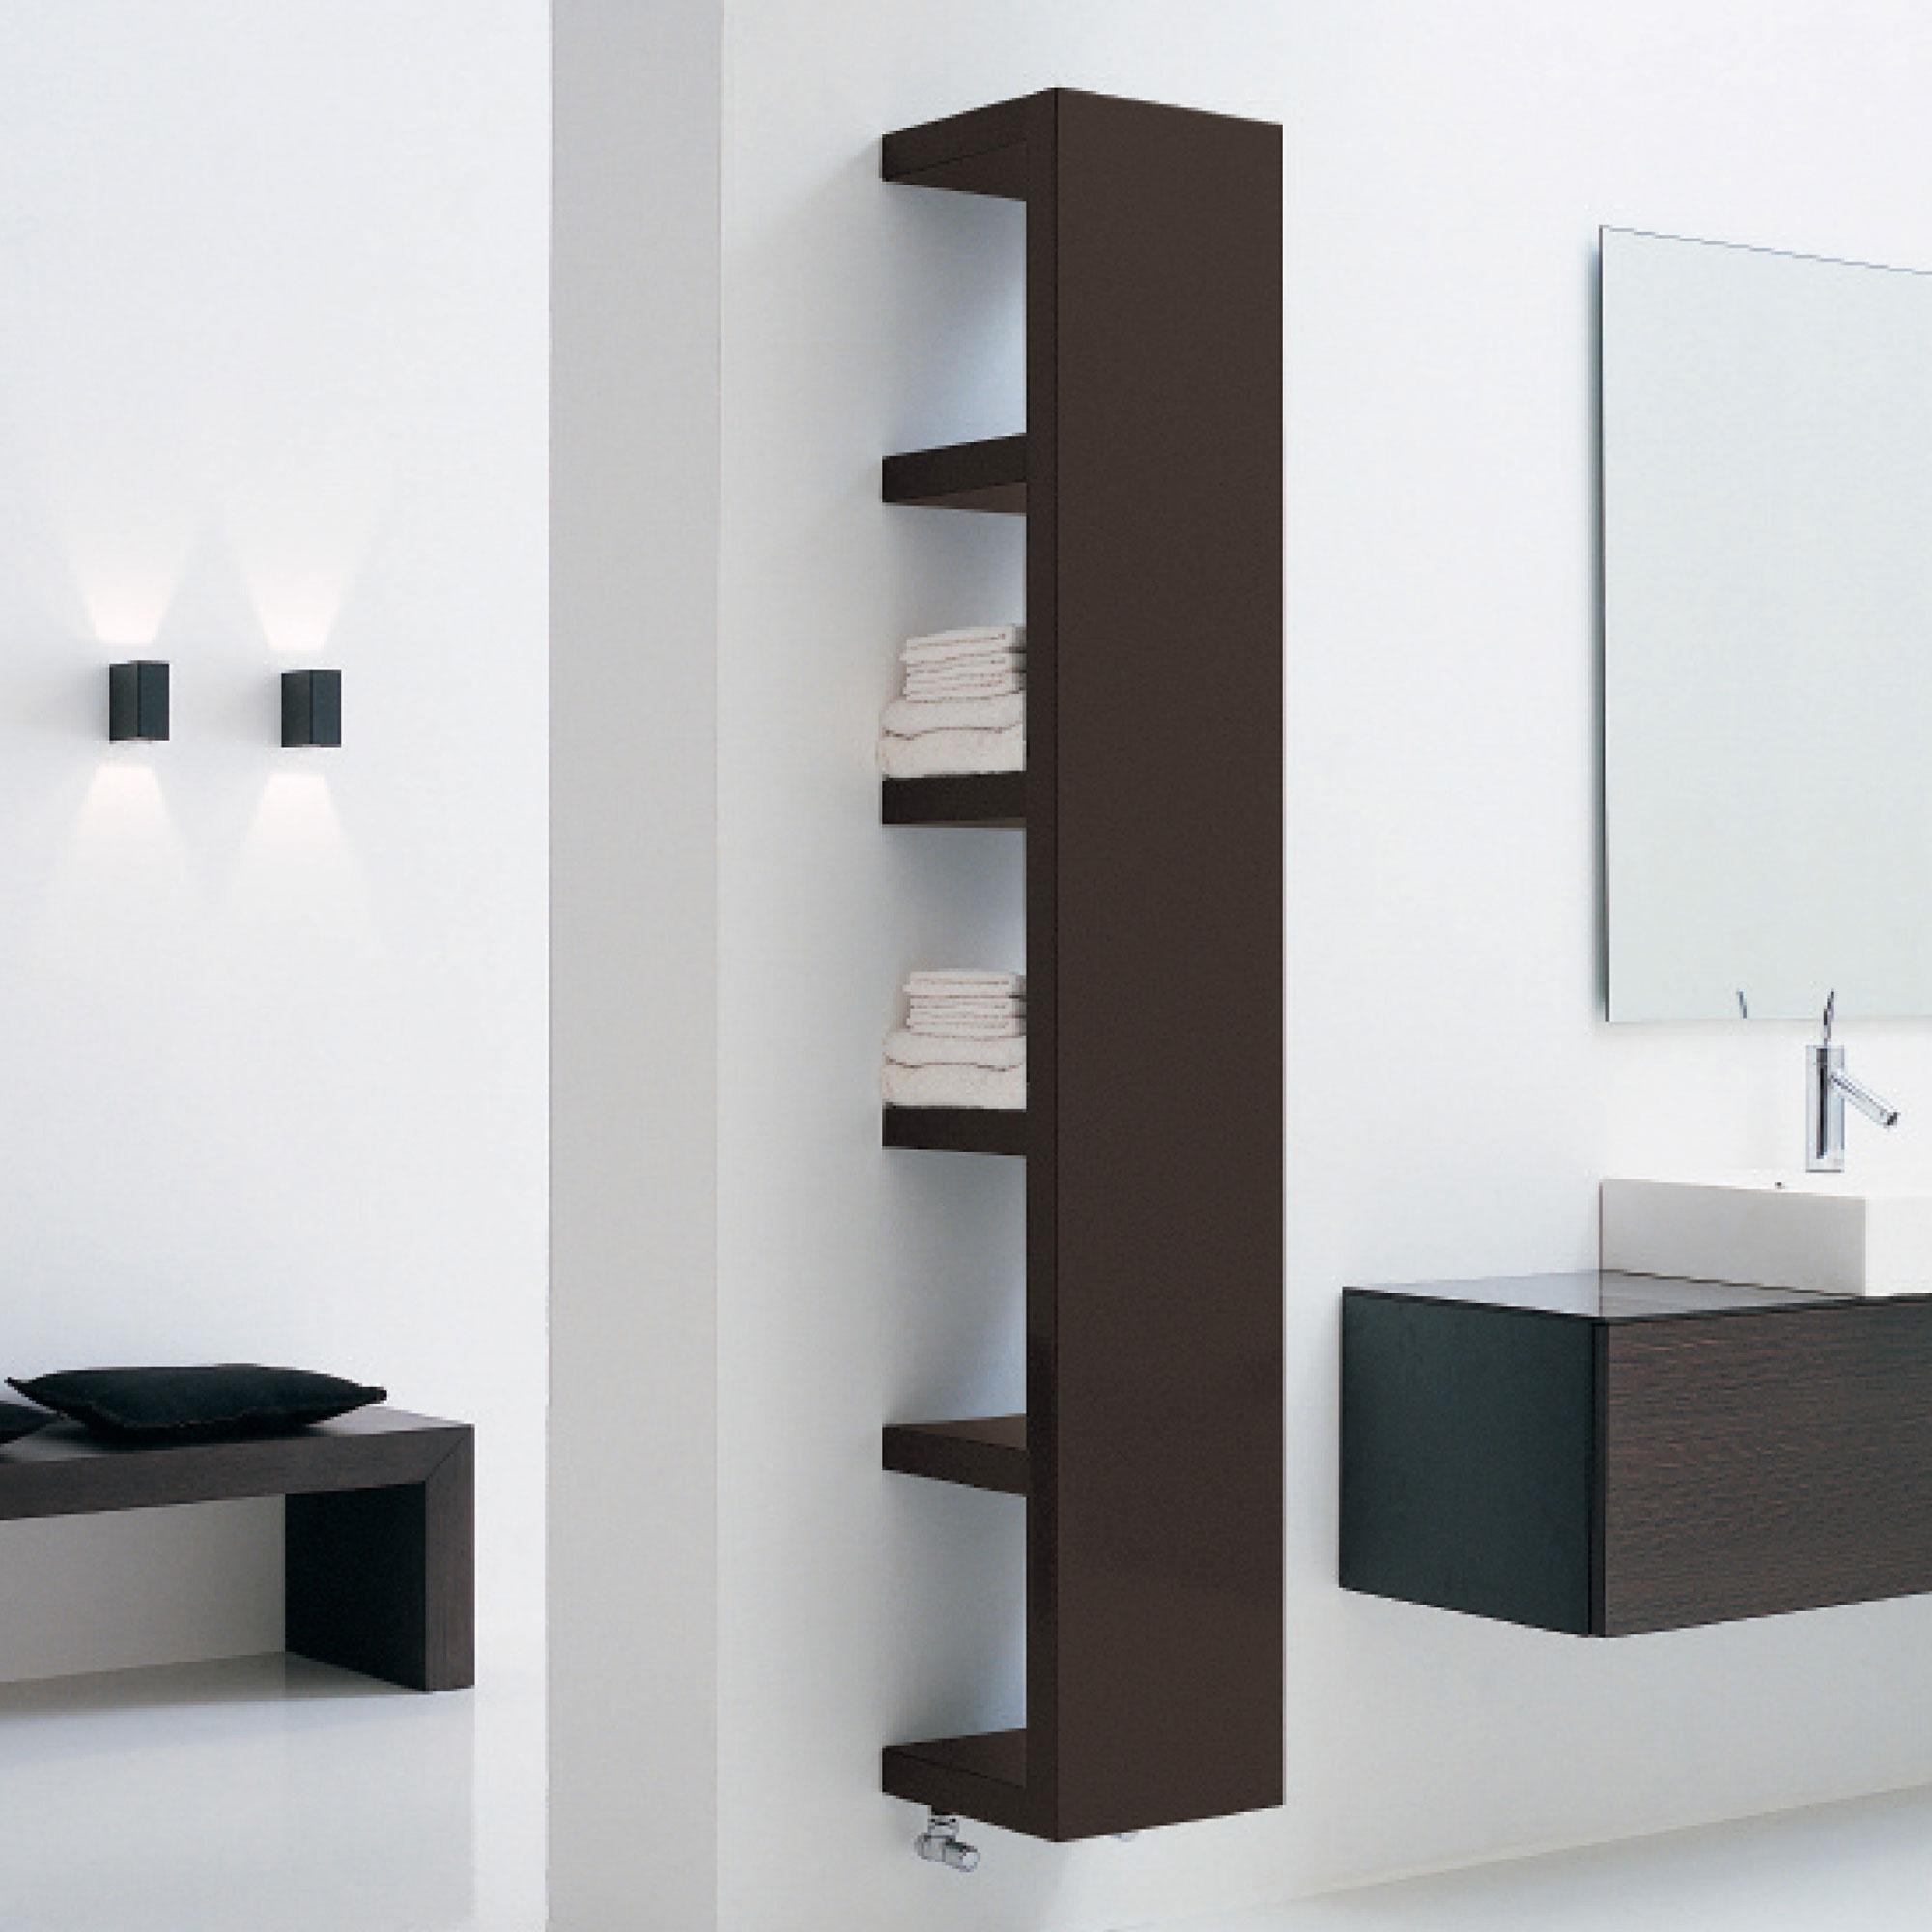 El radiador toallero est de moda gamma azara - Radiadores para bano ...